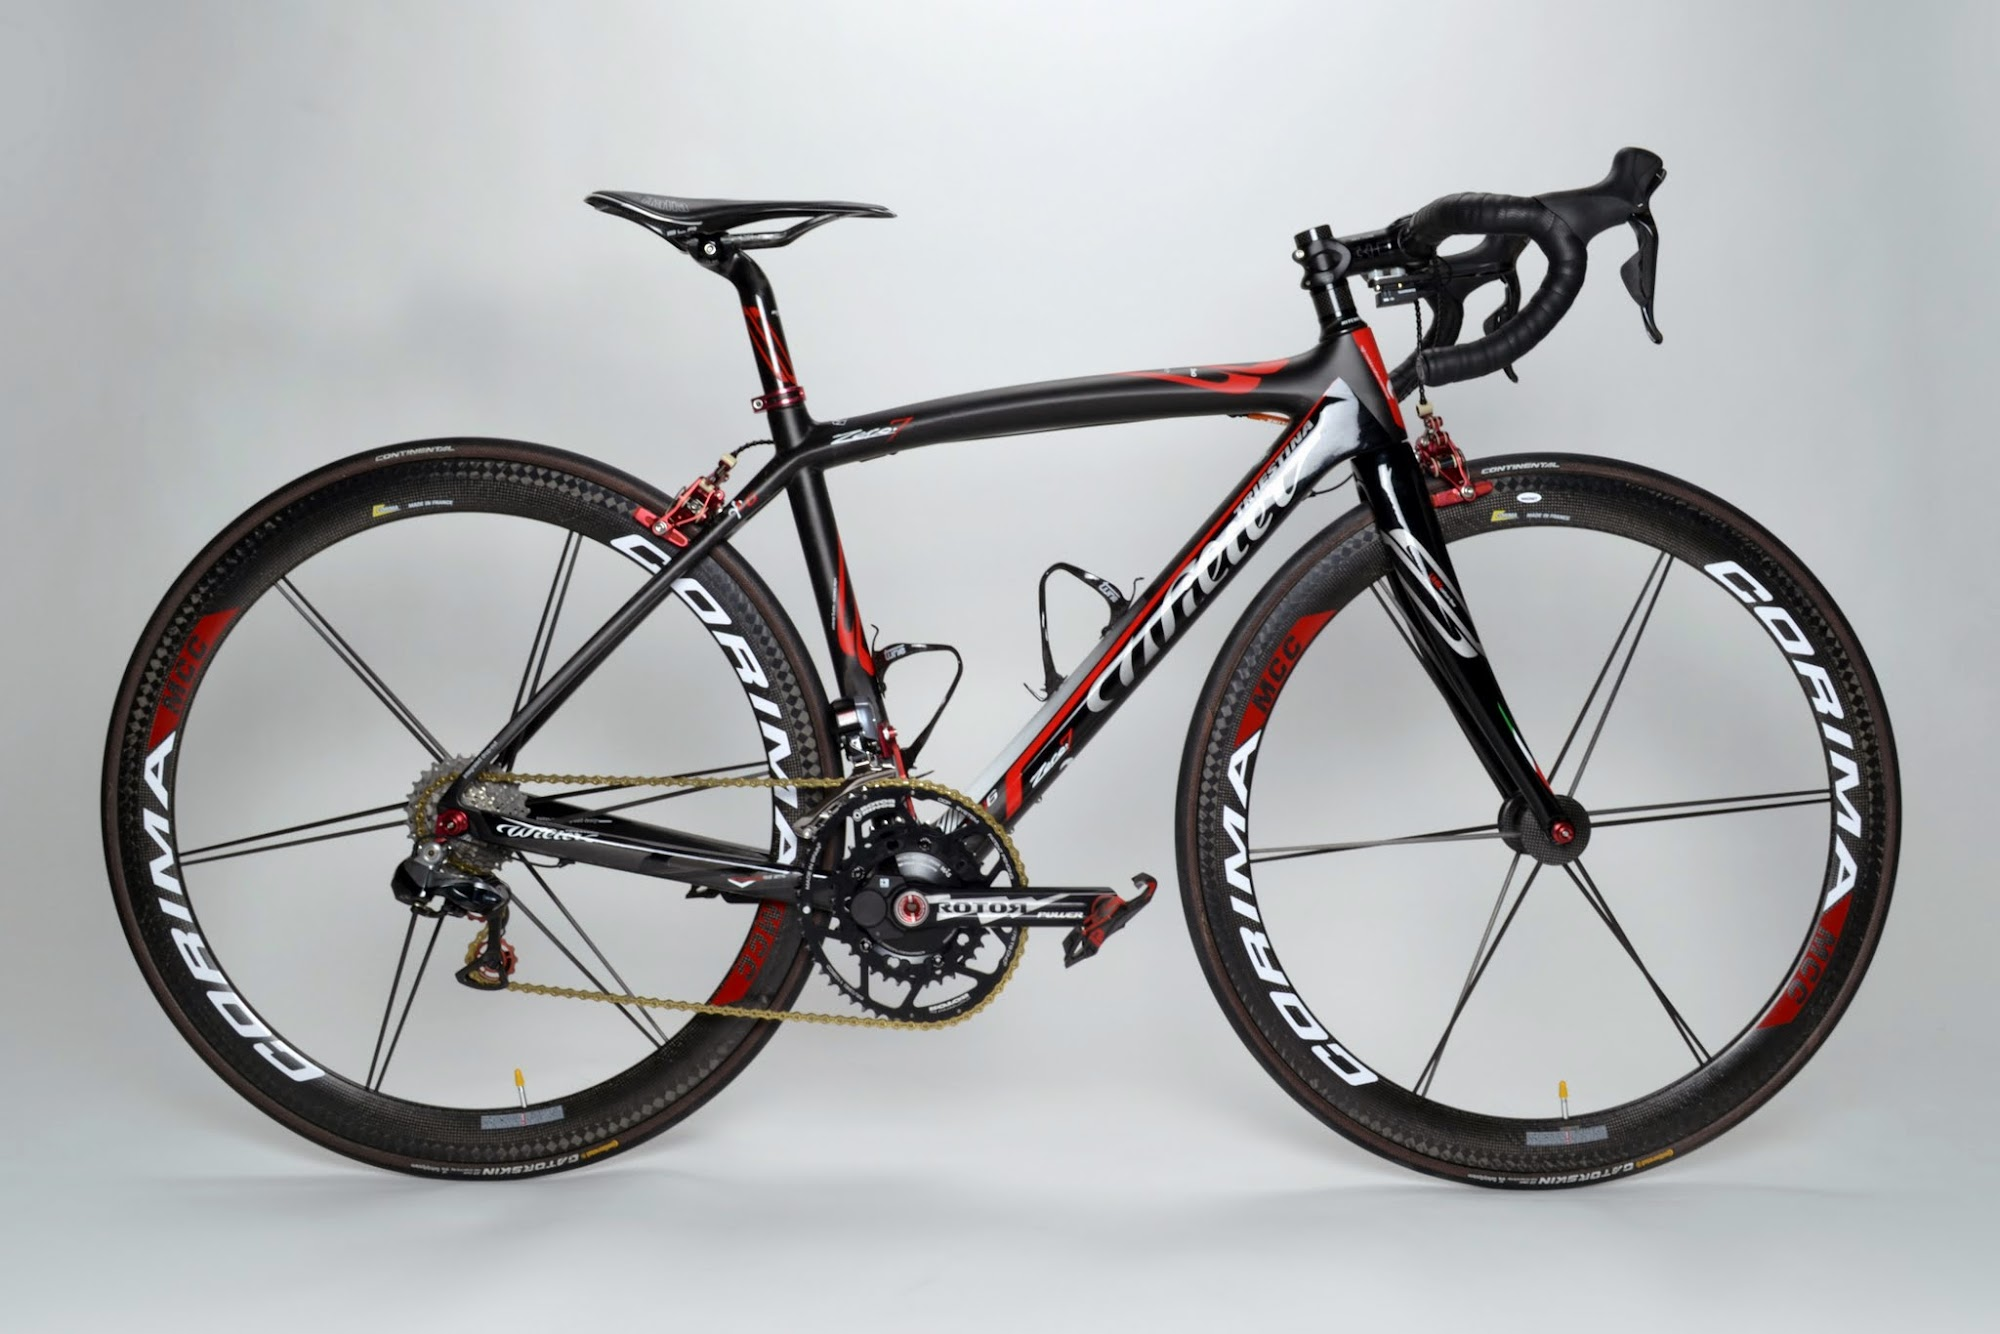 www.twohubs.com: Wilier Triestina Zero.7 Shimano Dura Ace 9070 Di2 Comina Aero MCC Complete Bike